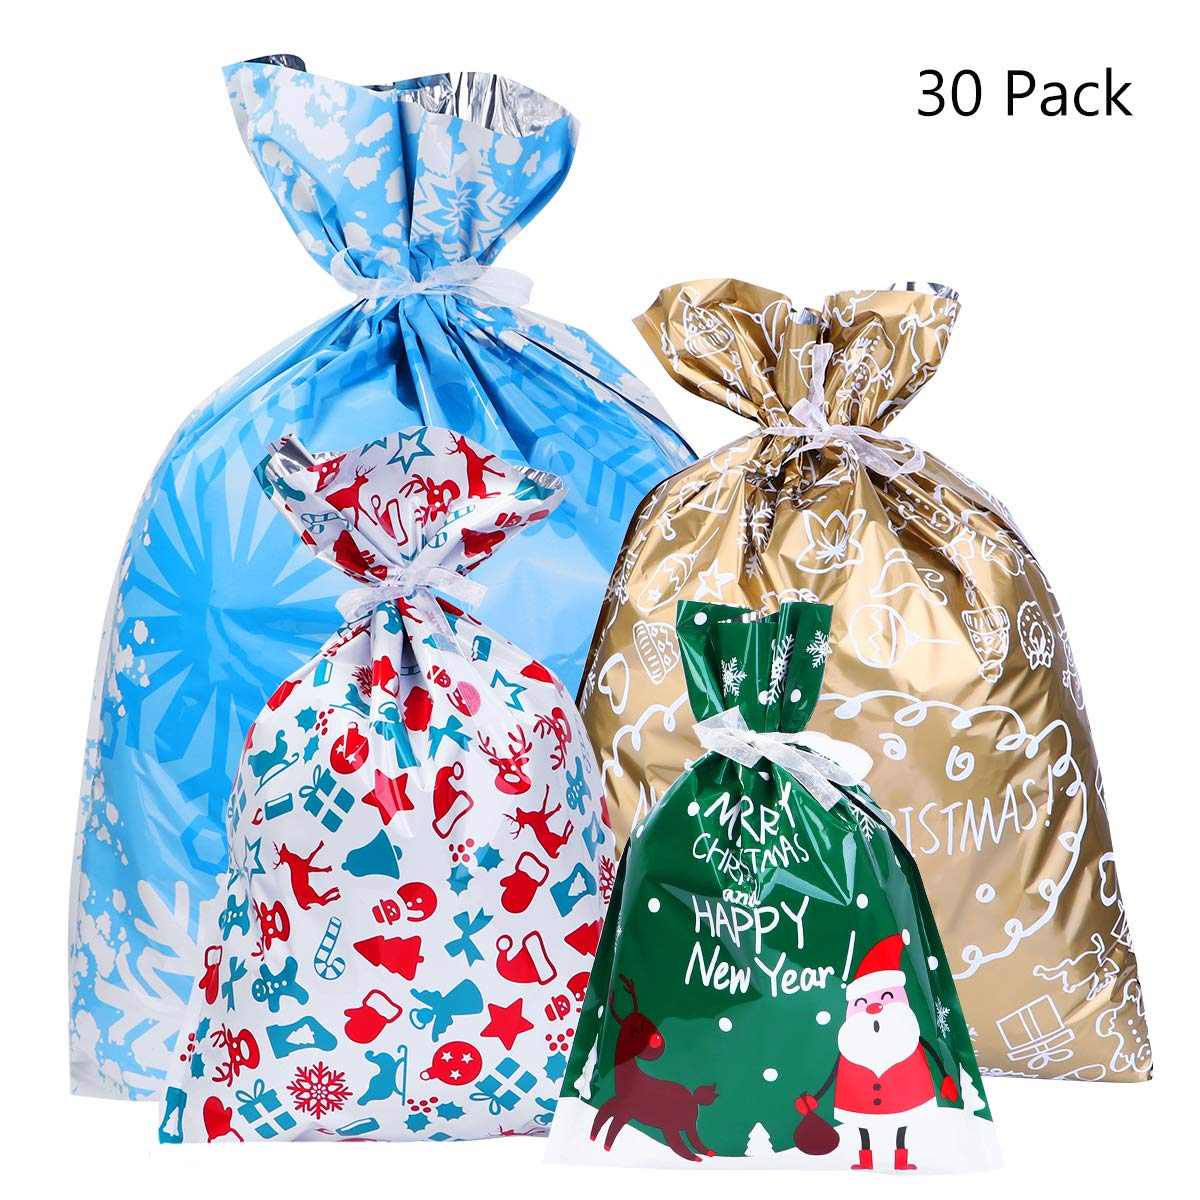 BESTOYARD 30PCS Christmas Gift Bag Christmas Goody Bags Gift Wrapping Assorted Styles with 30pcs Ribbon Ties  sc 1 st  Amazon UK & Gift Wrap Bags: Amazon.co.uk